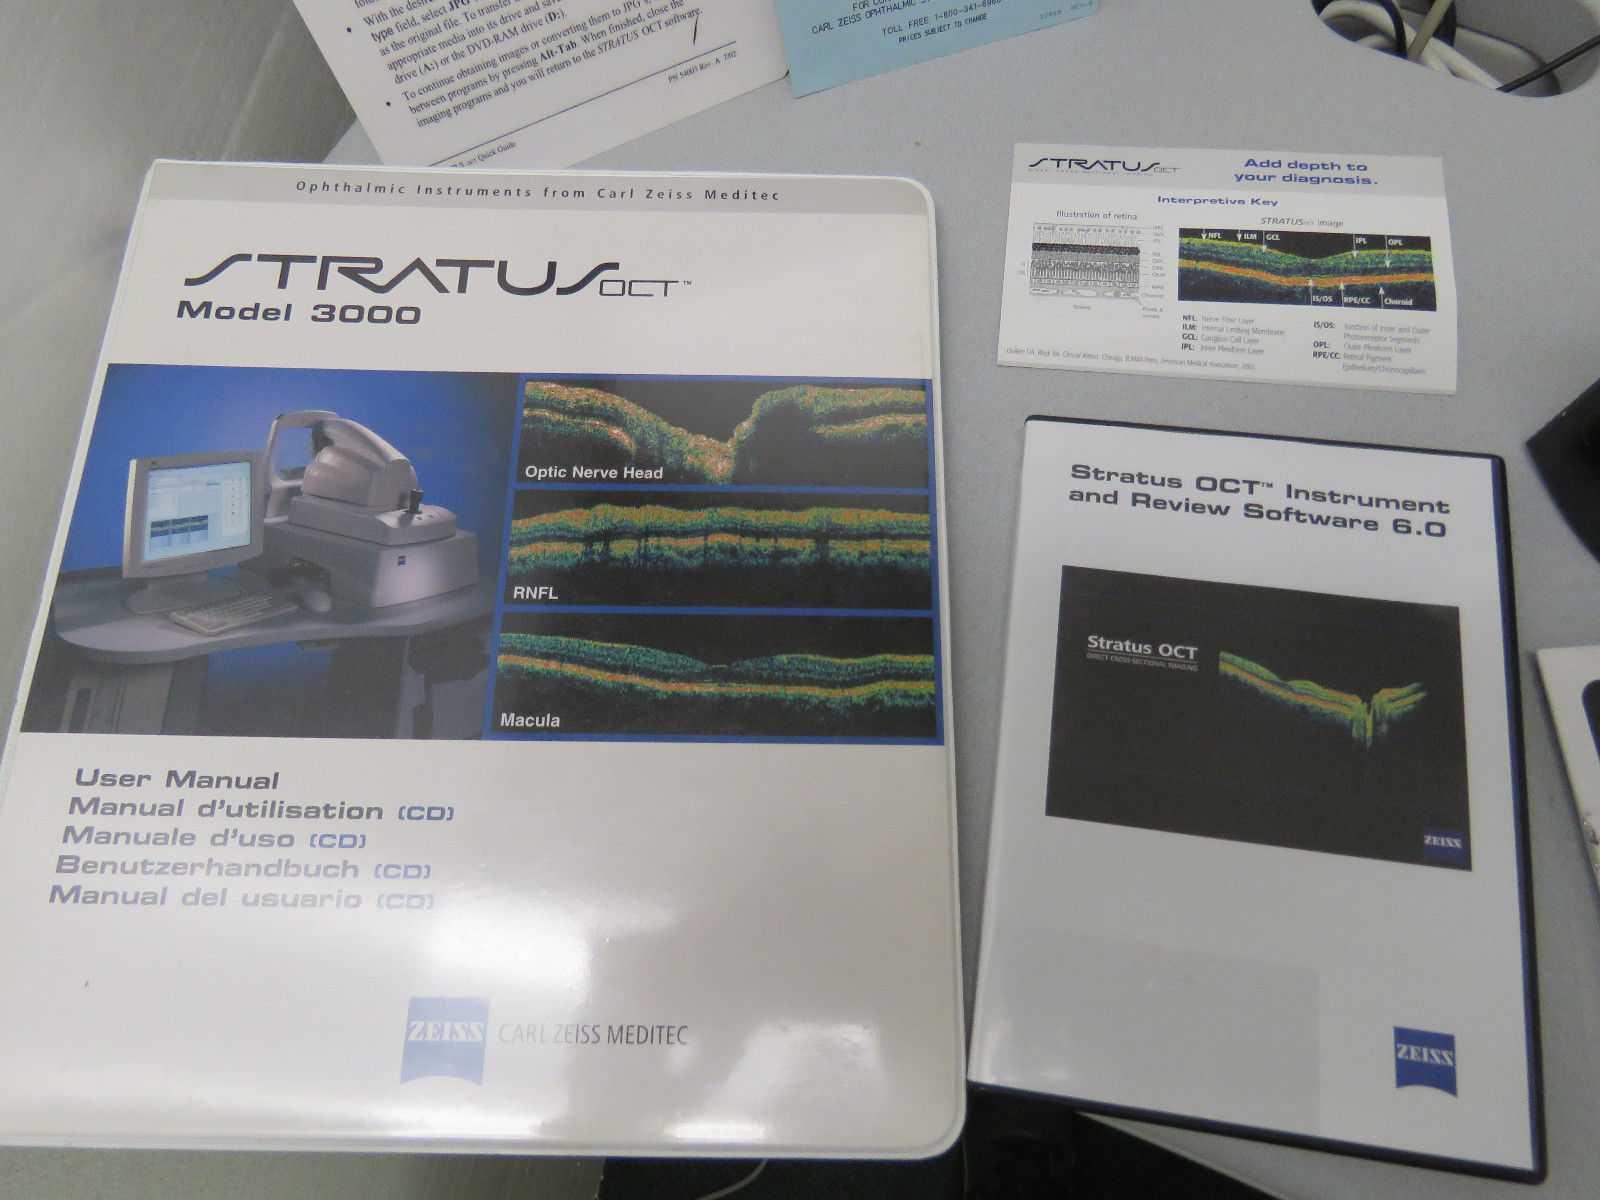 CARL ZEISS Stratus OCT III Tomographer with 7.0 Software